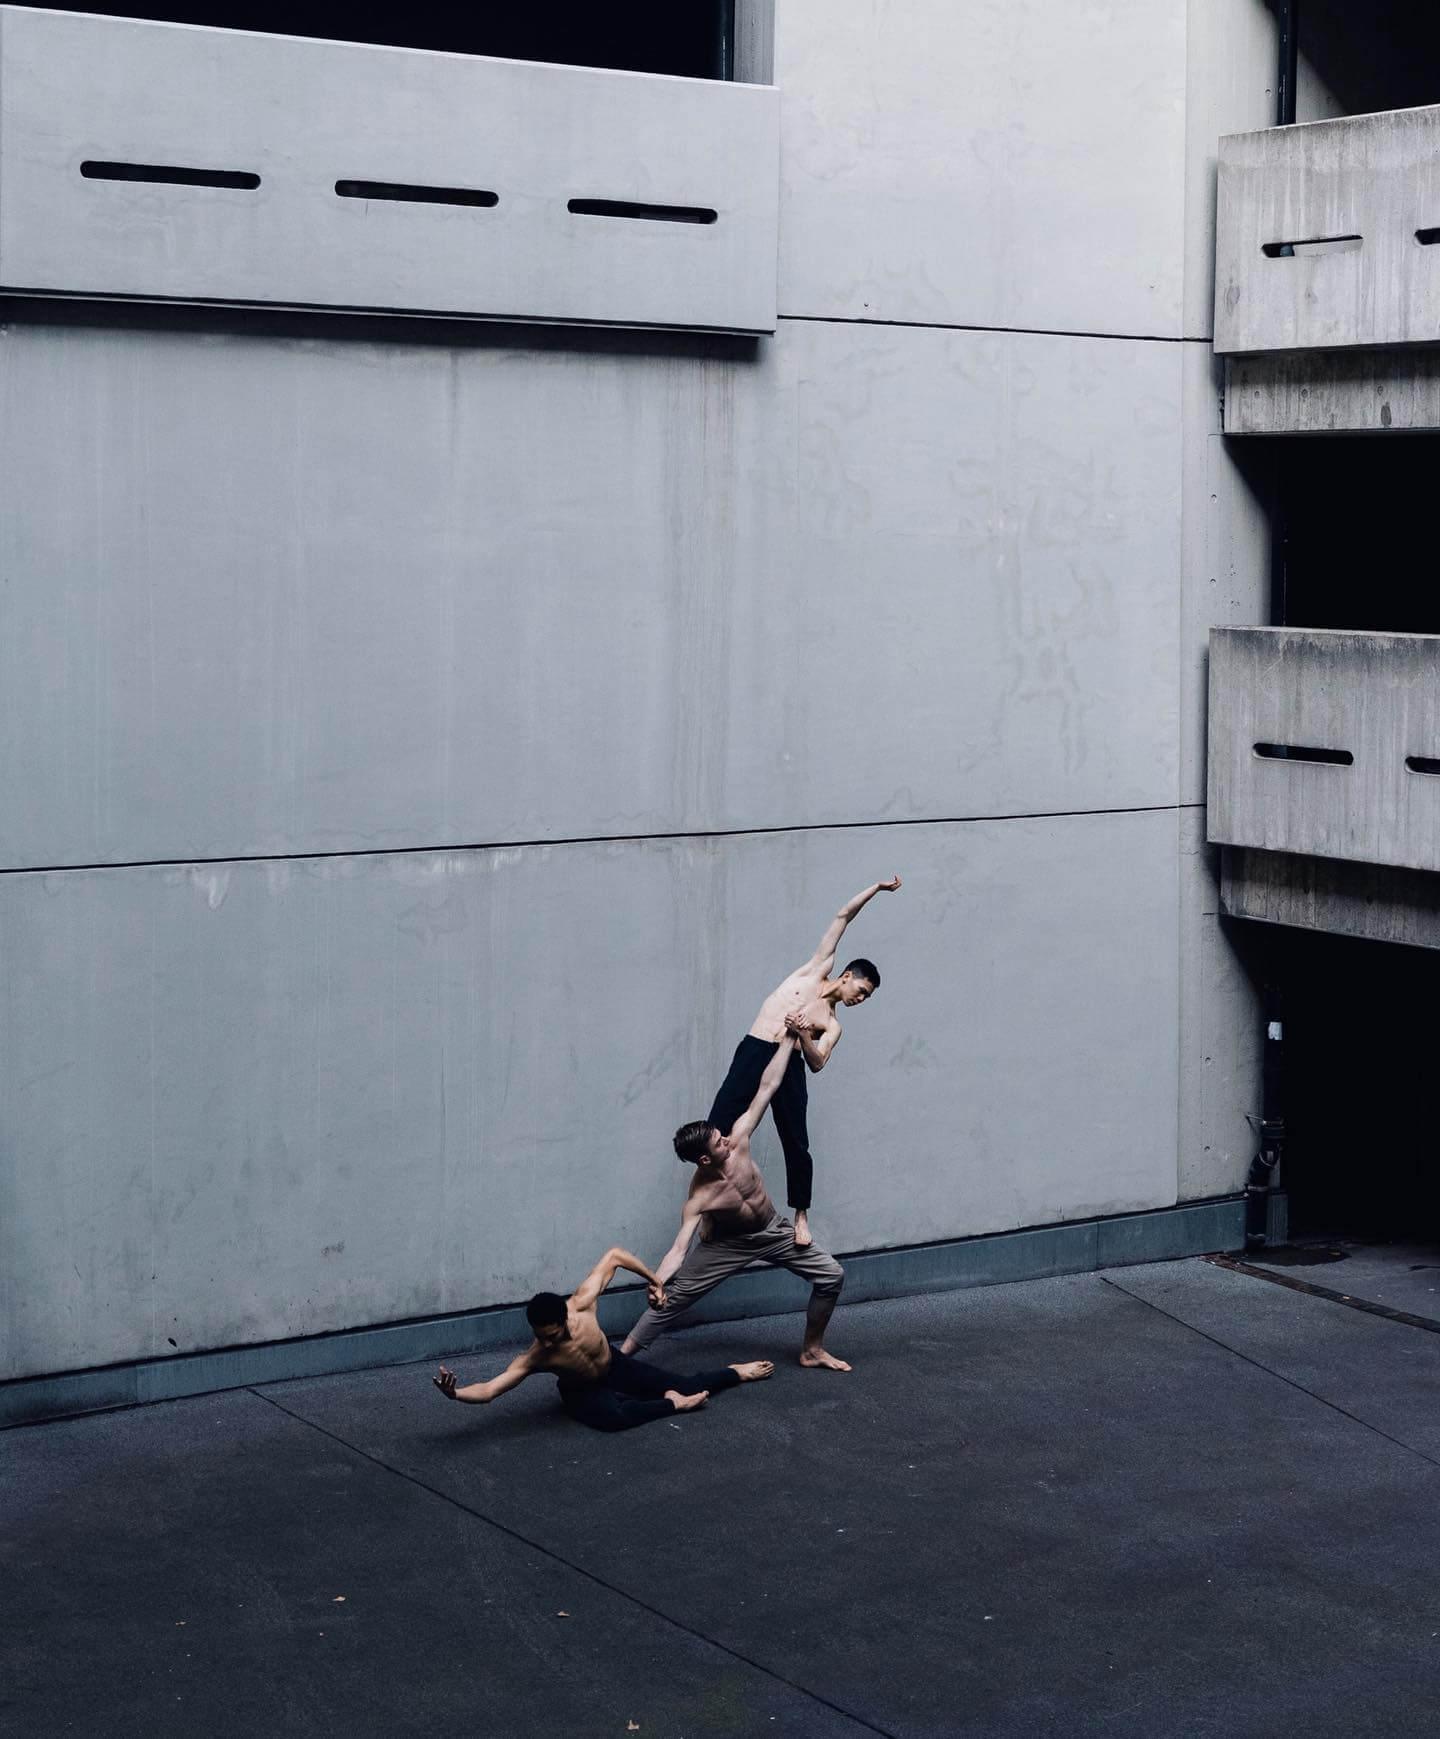 Minimalism architecture, human sculpture